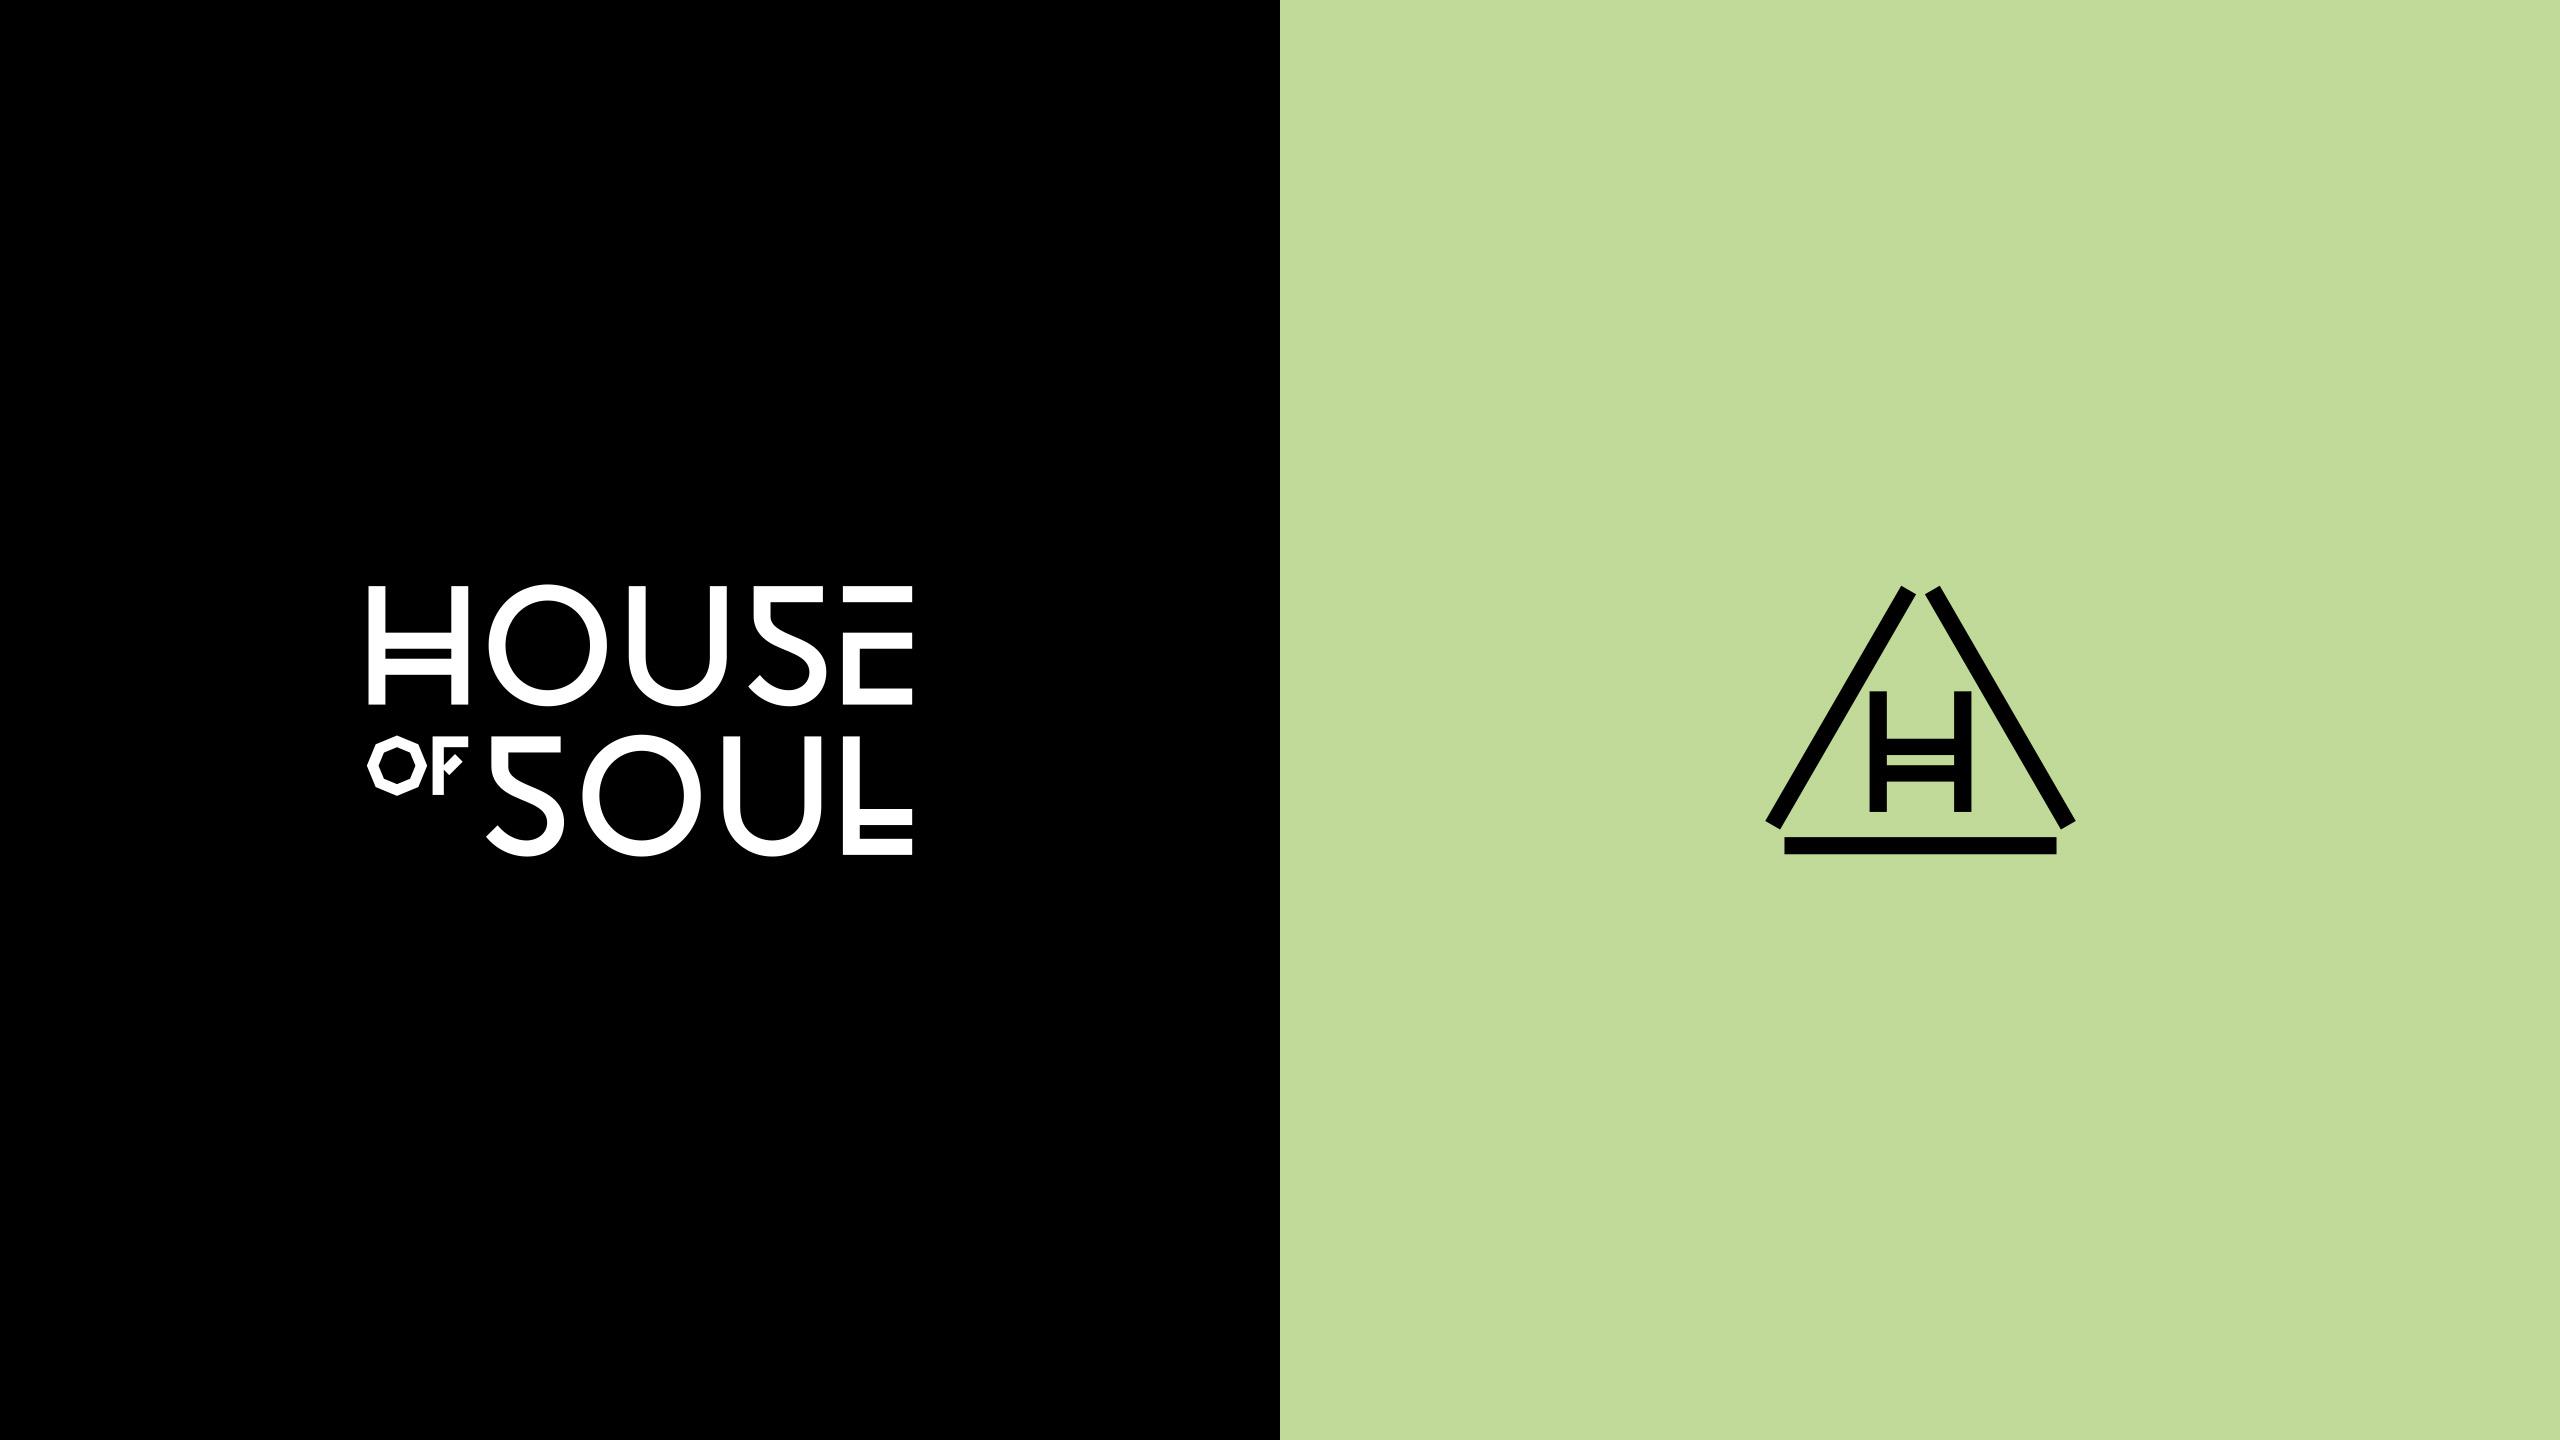 firmorama_house-of-soul_03